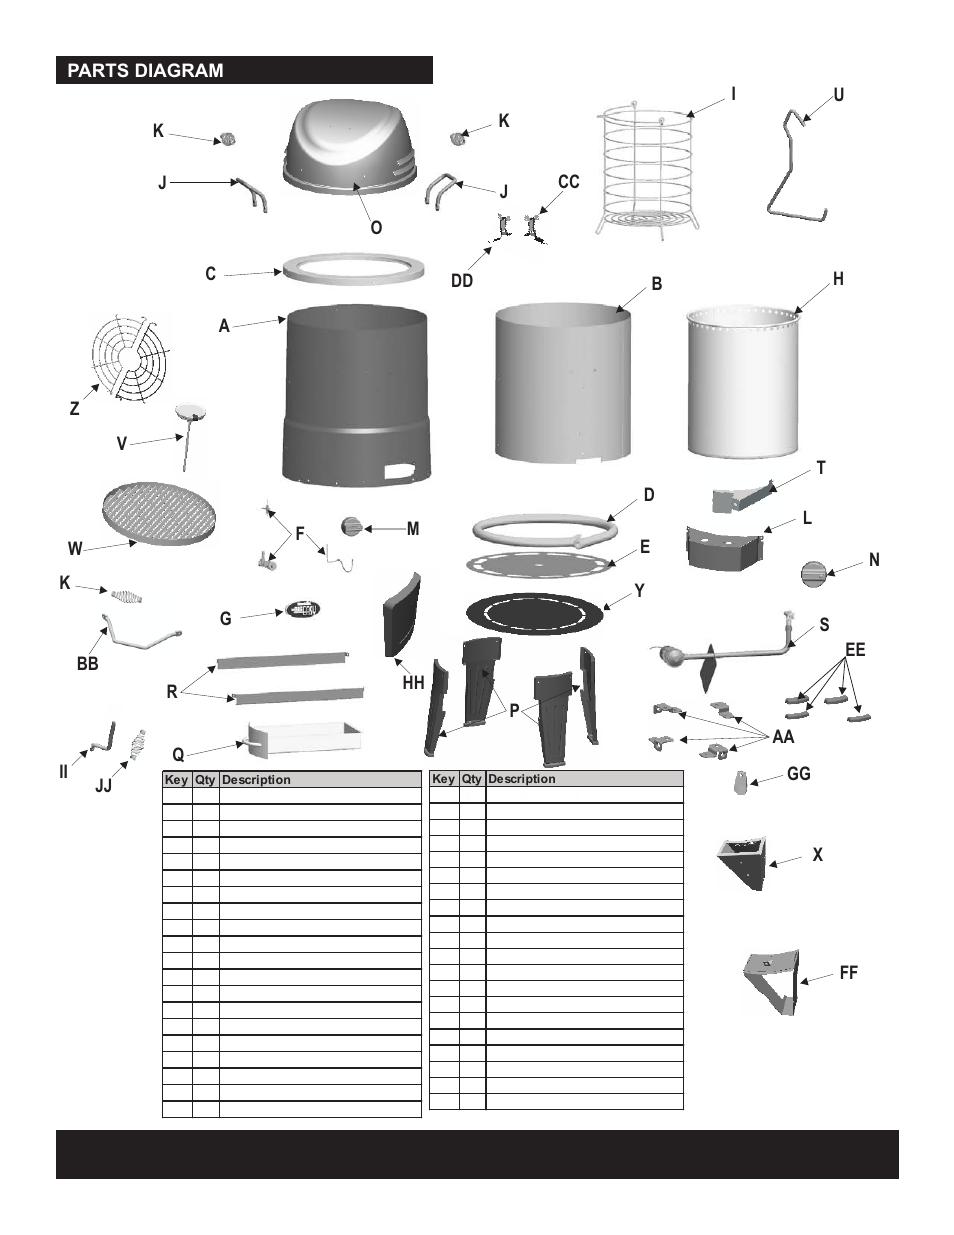 42804470 Big Easy Recipe/ Usage Guide/ English | Char-Broil®